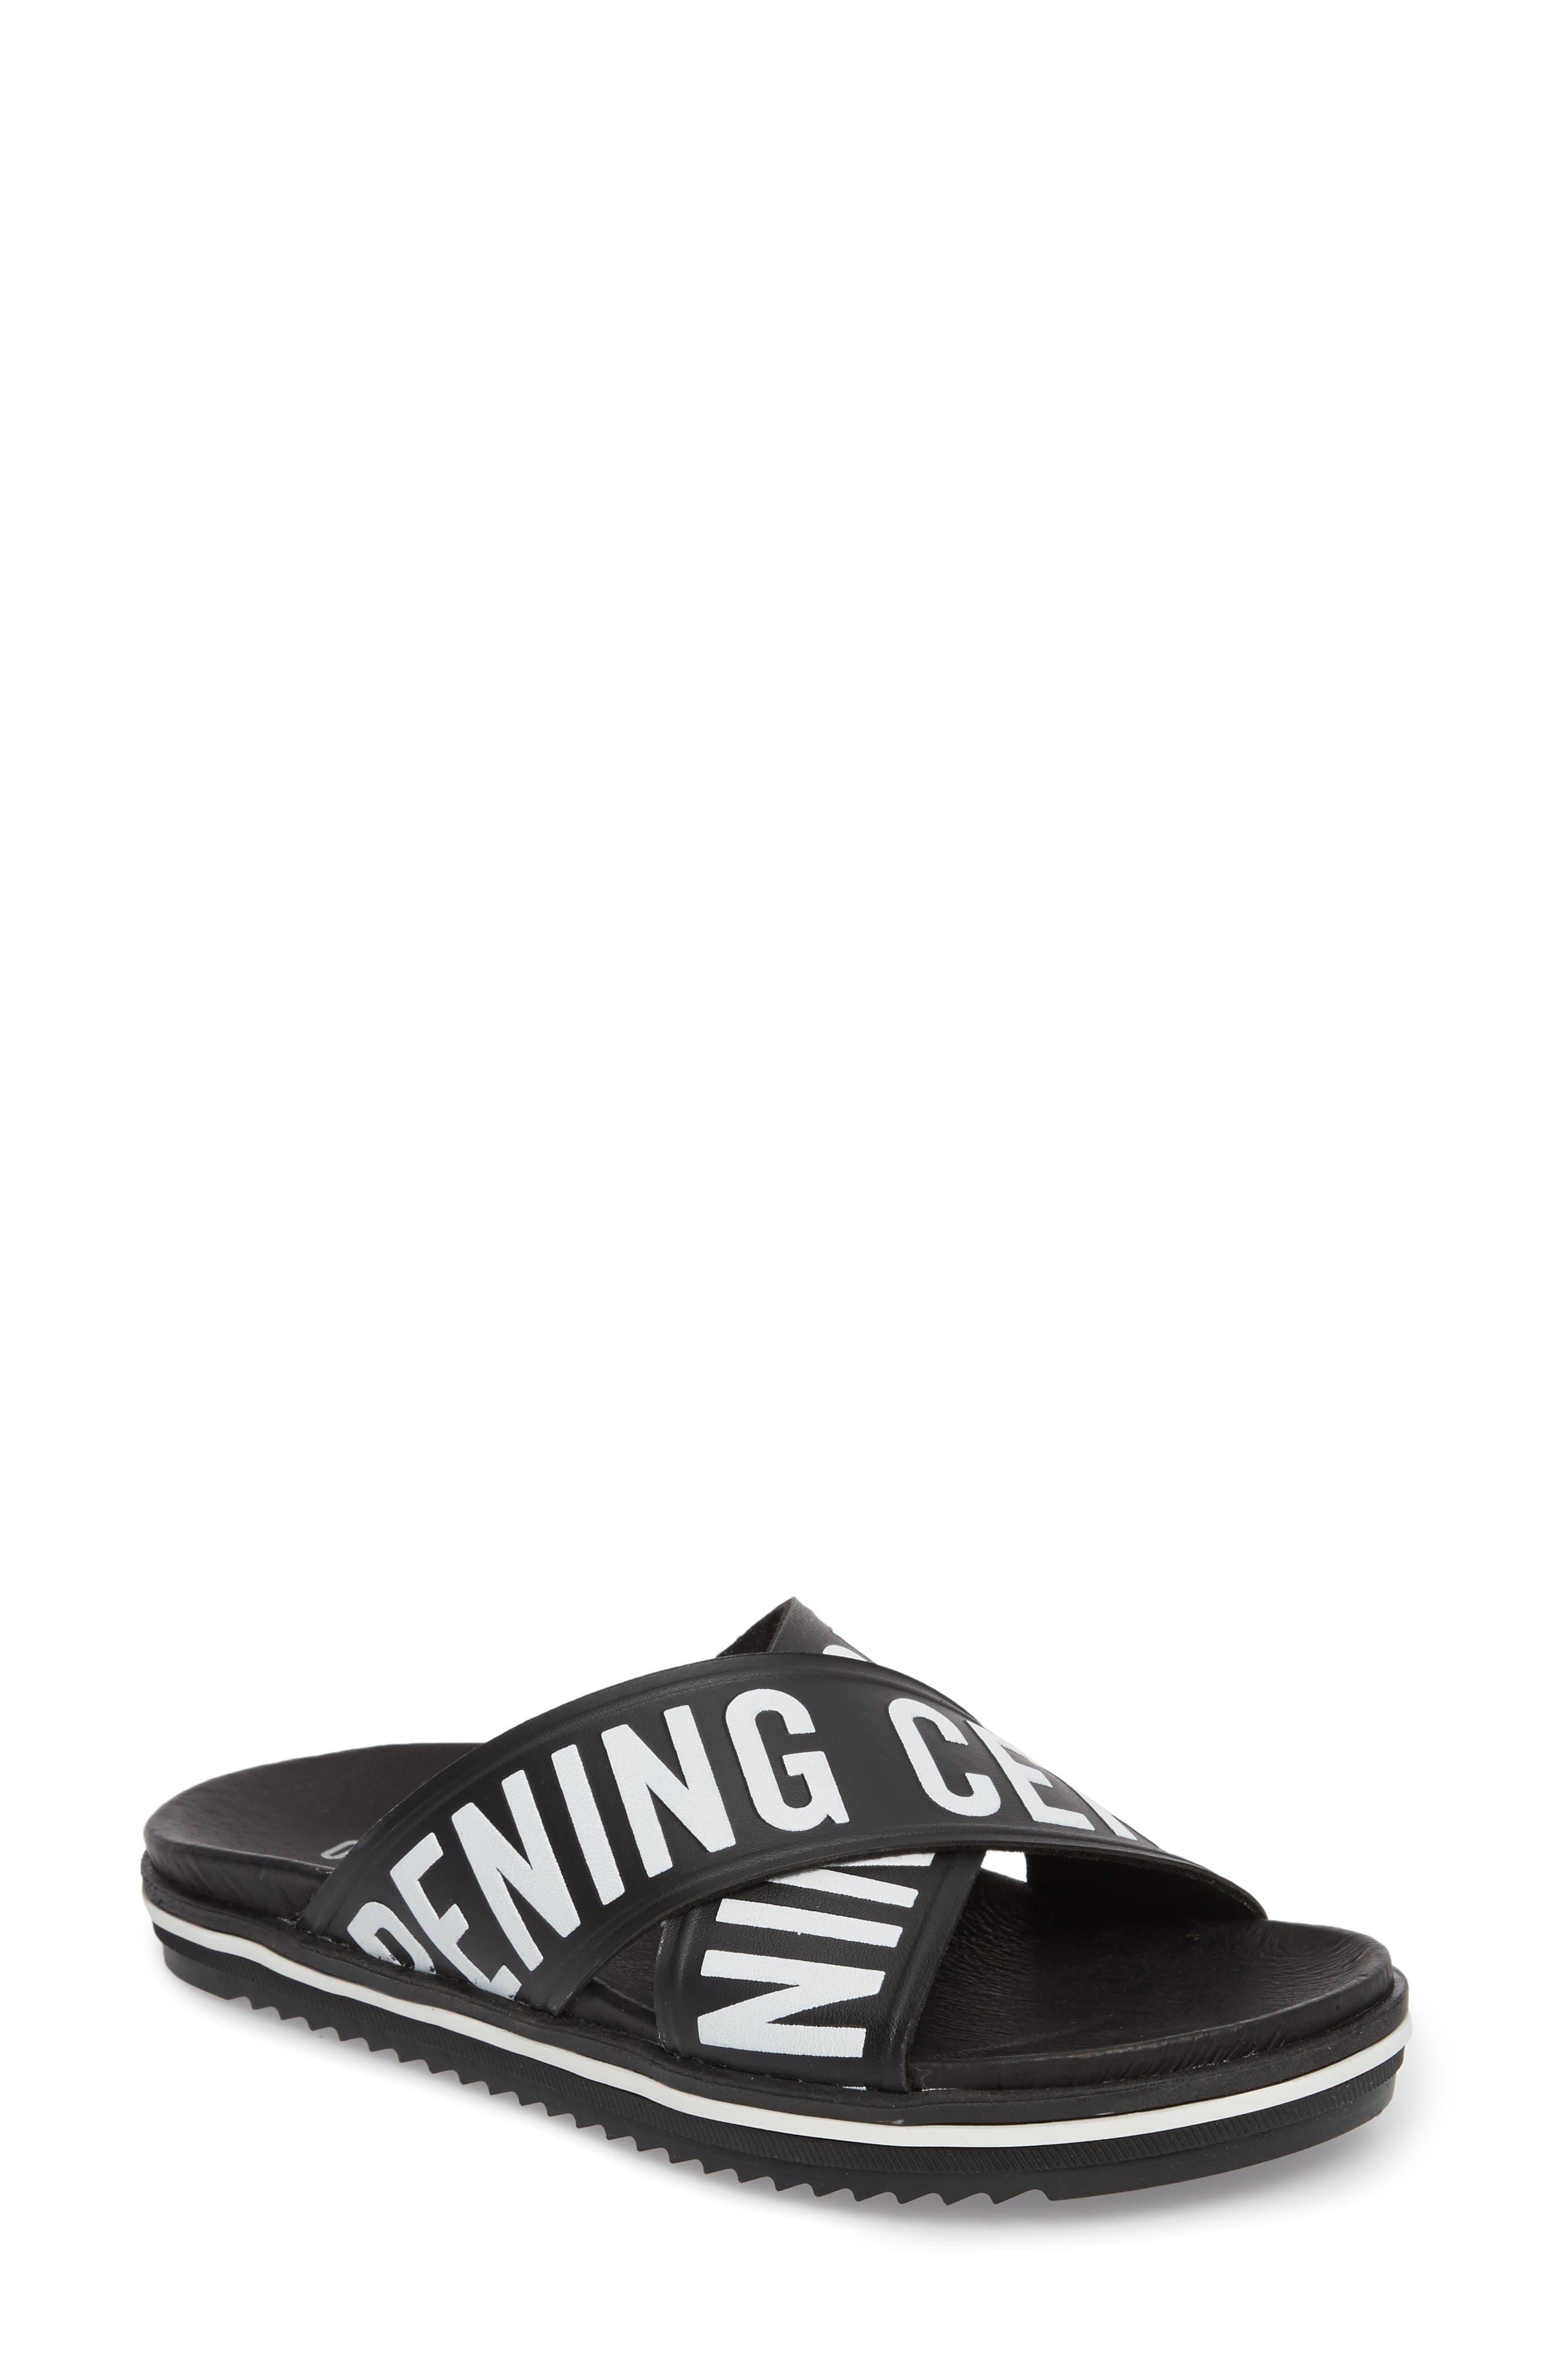 Berkeley Slide Sandal,                         Main,                         color, BLACK MULTI